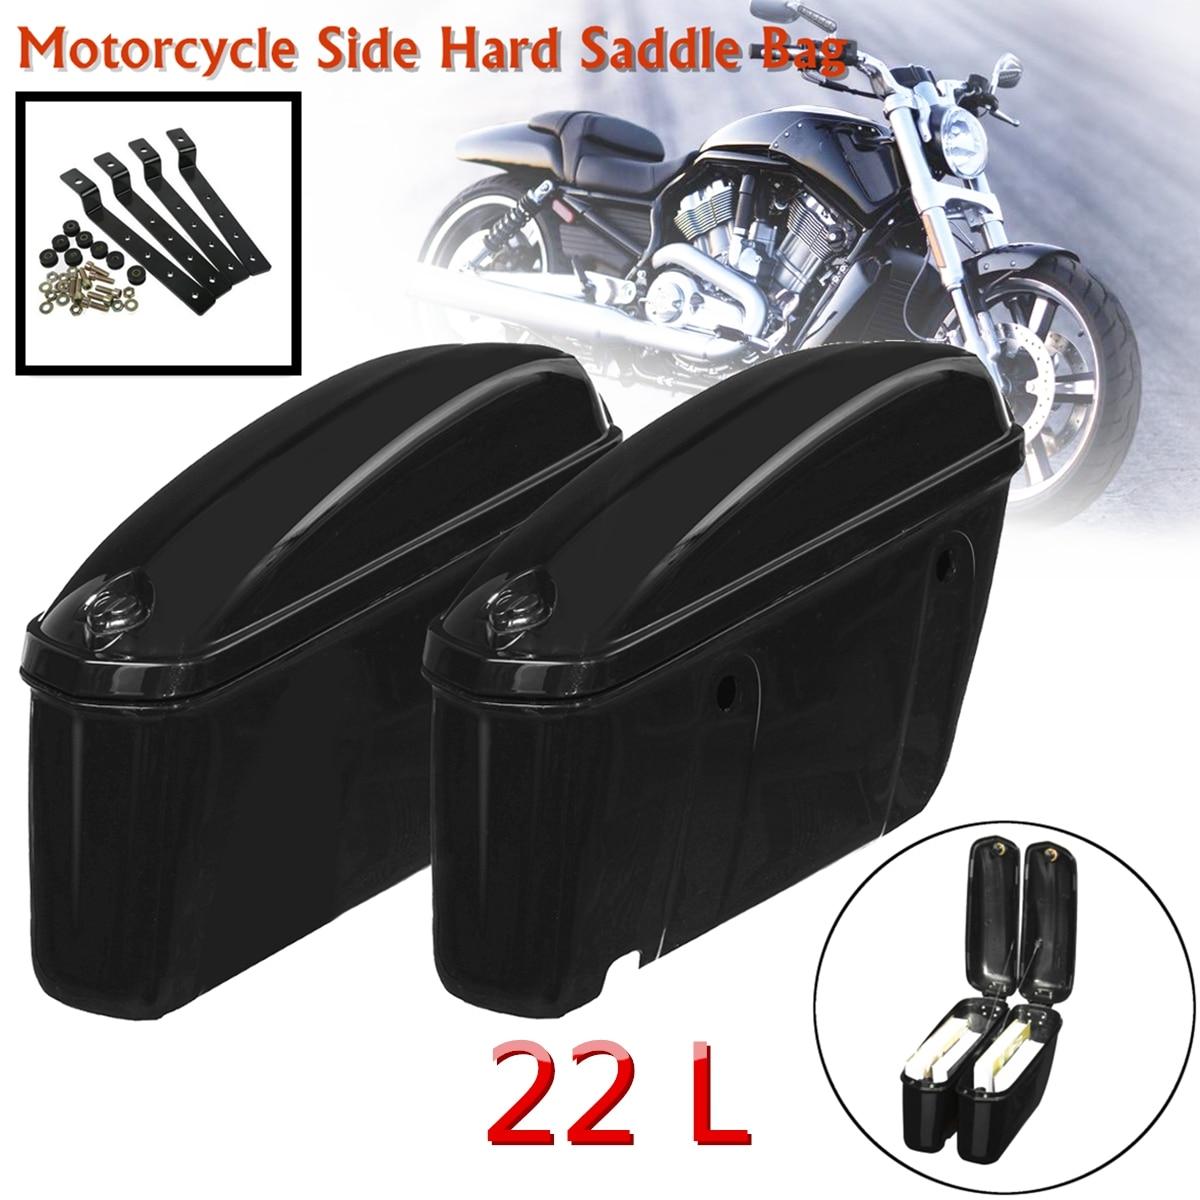 22L Black Motorcycle Side Hard Saddle Bags Saddlebags Trunk Luggage Suitcase for Honda/Harley/Yamaha/Suzuki Touring black motorcycle trunk tail box w taillight for harley honda yamaha suzuki vulcan cruiser